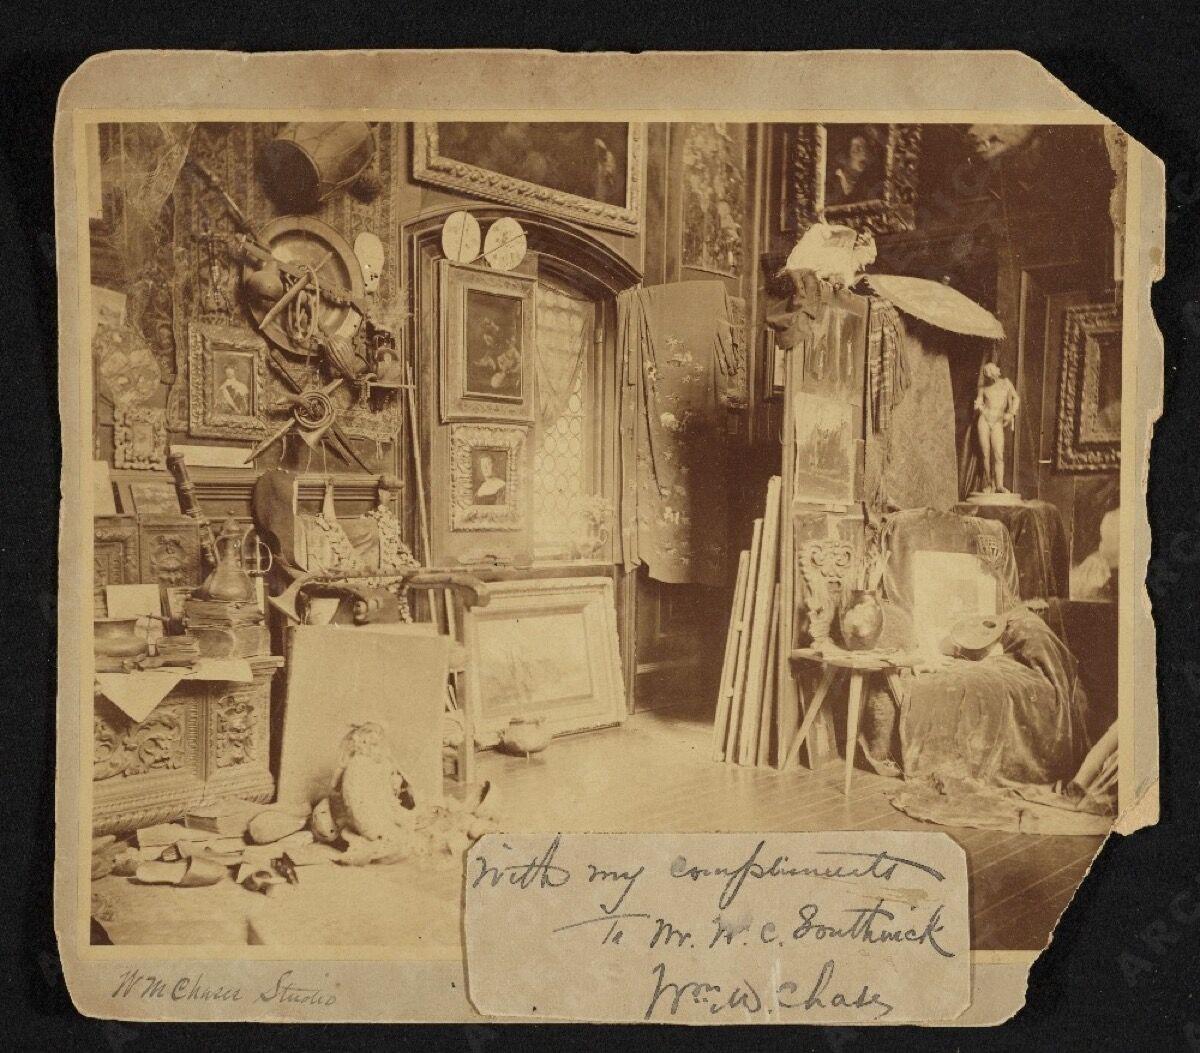 William Merritt Chase's 10th Street studio in New York, ca. 1880.Archives of American Art, Smithsonian Institution.